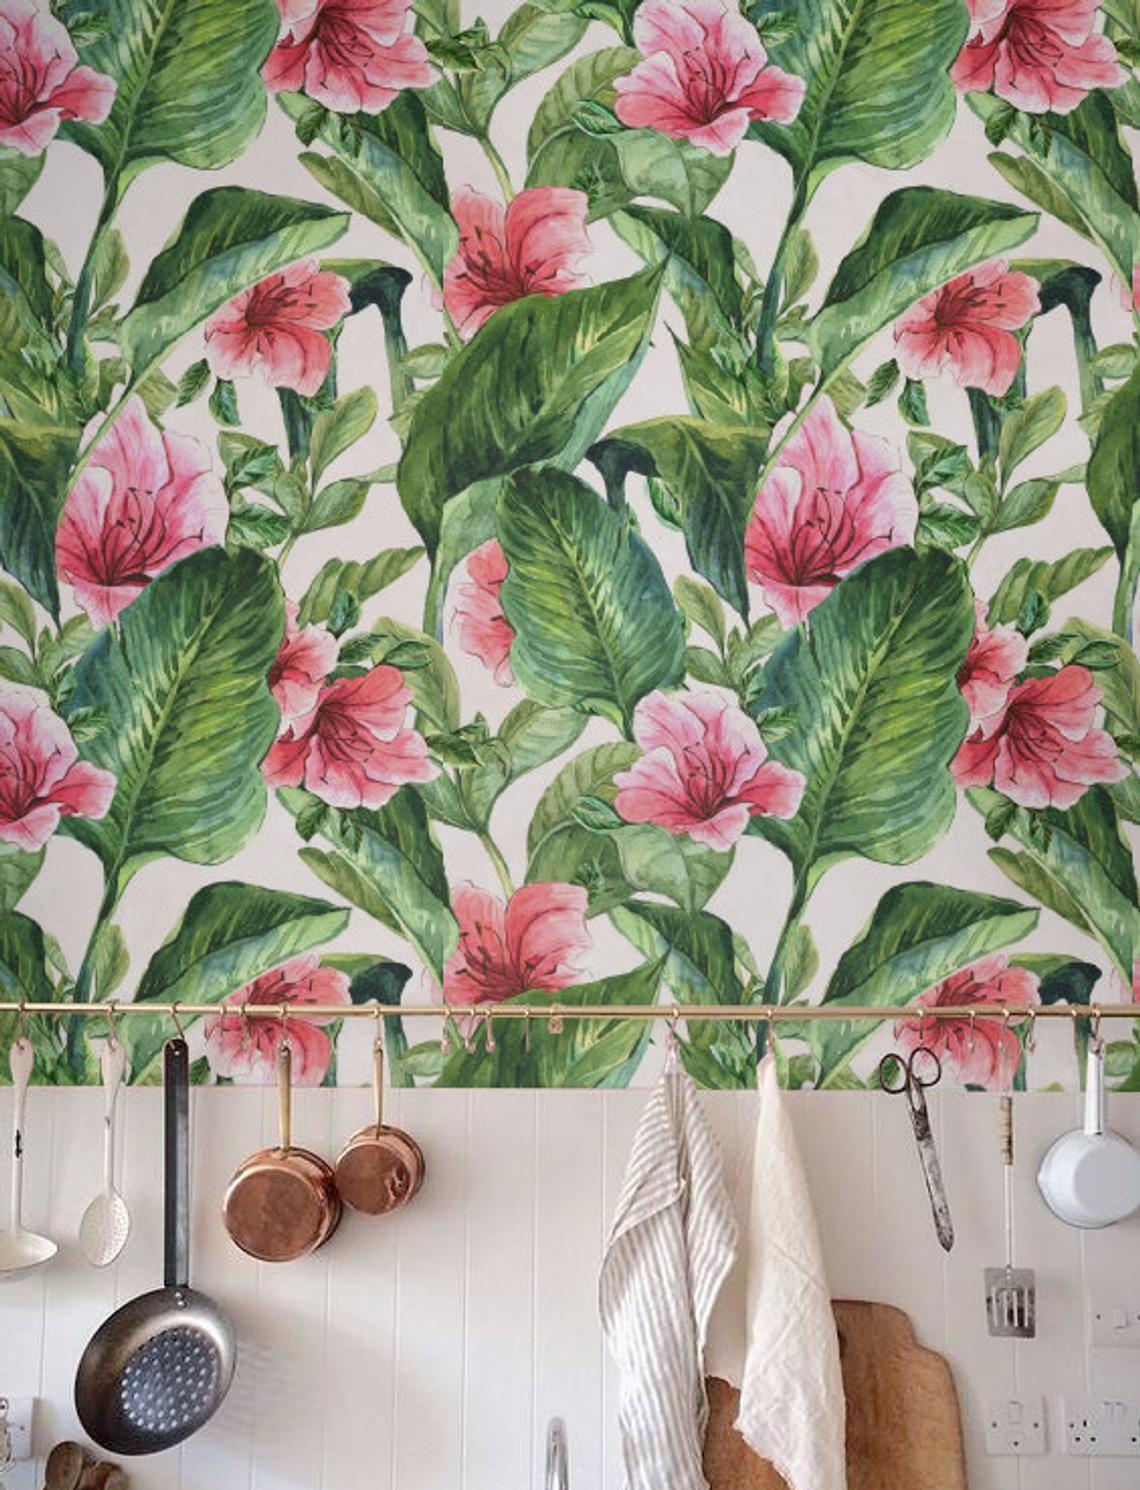 Banana leaf Wallpaper, Removable Wallpaper, Selfadhesive